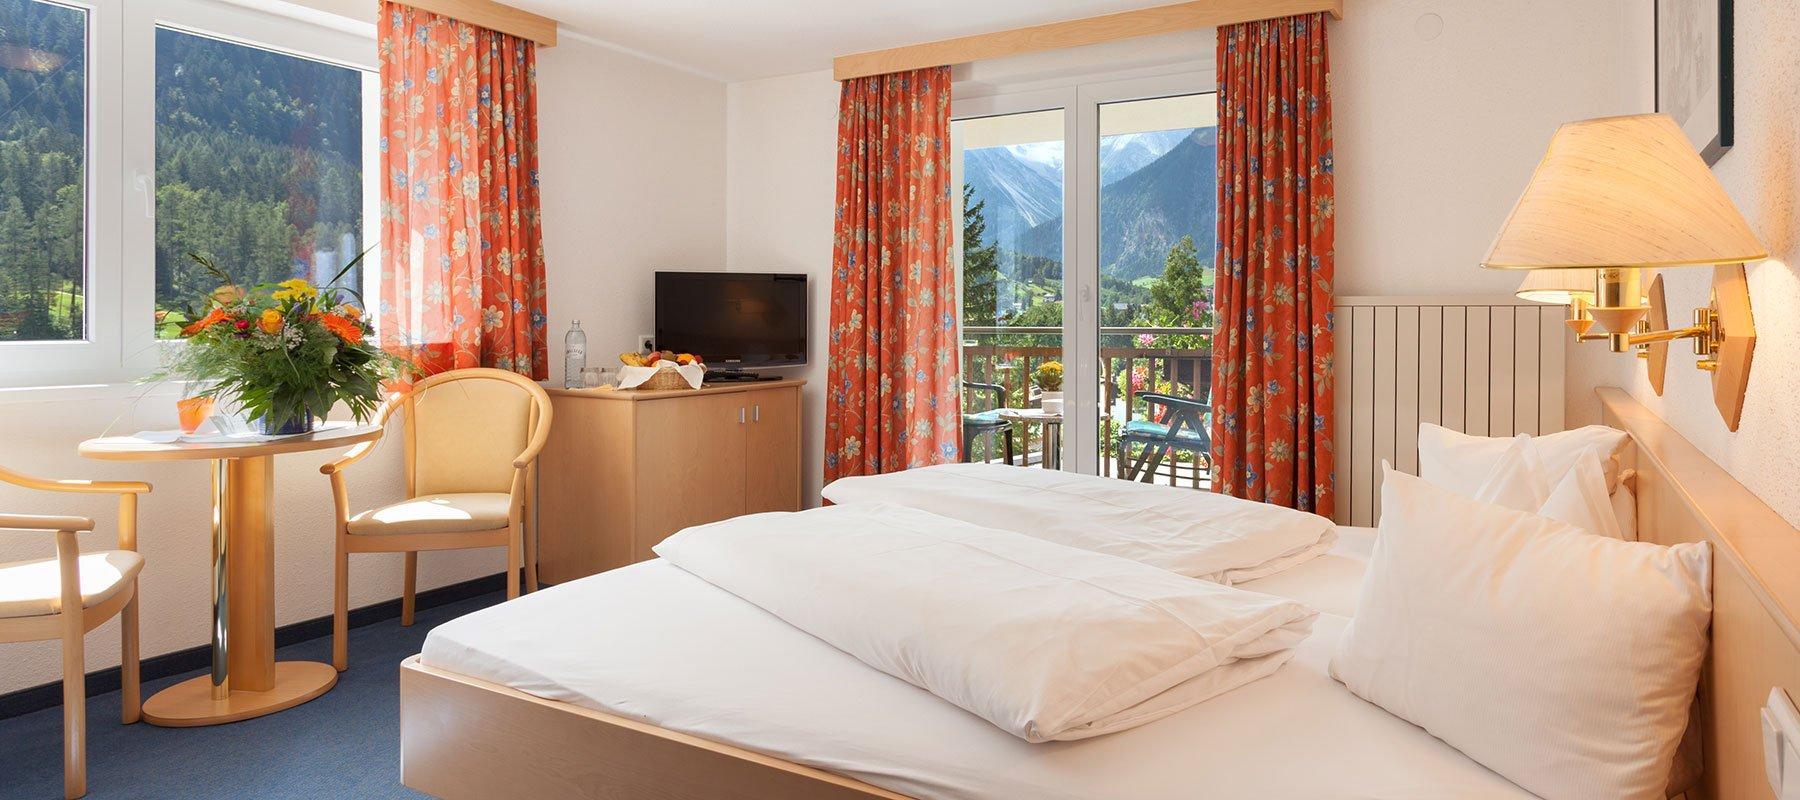 Zimmer im Alpenhotel Zimba